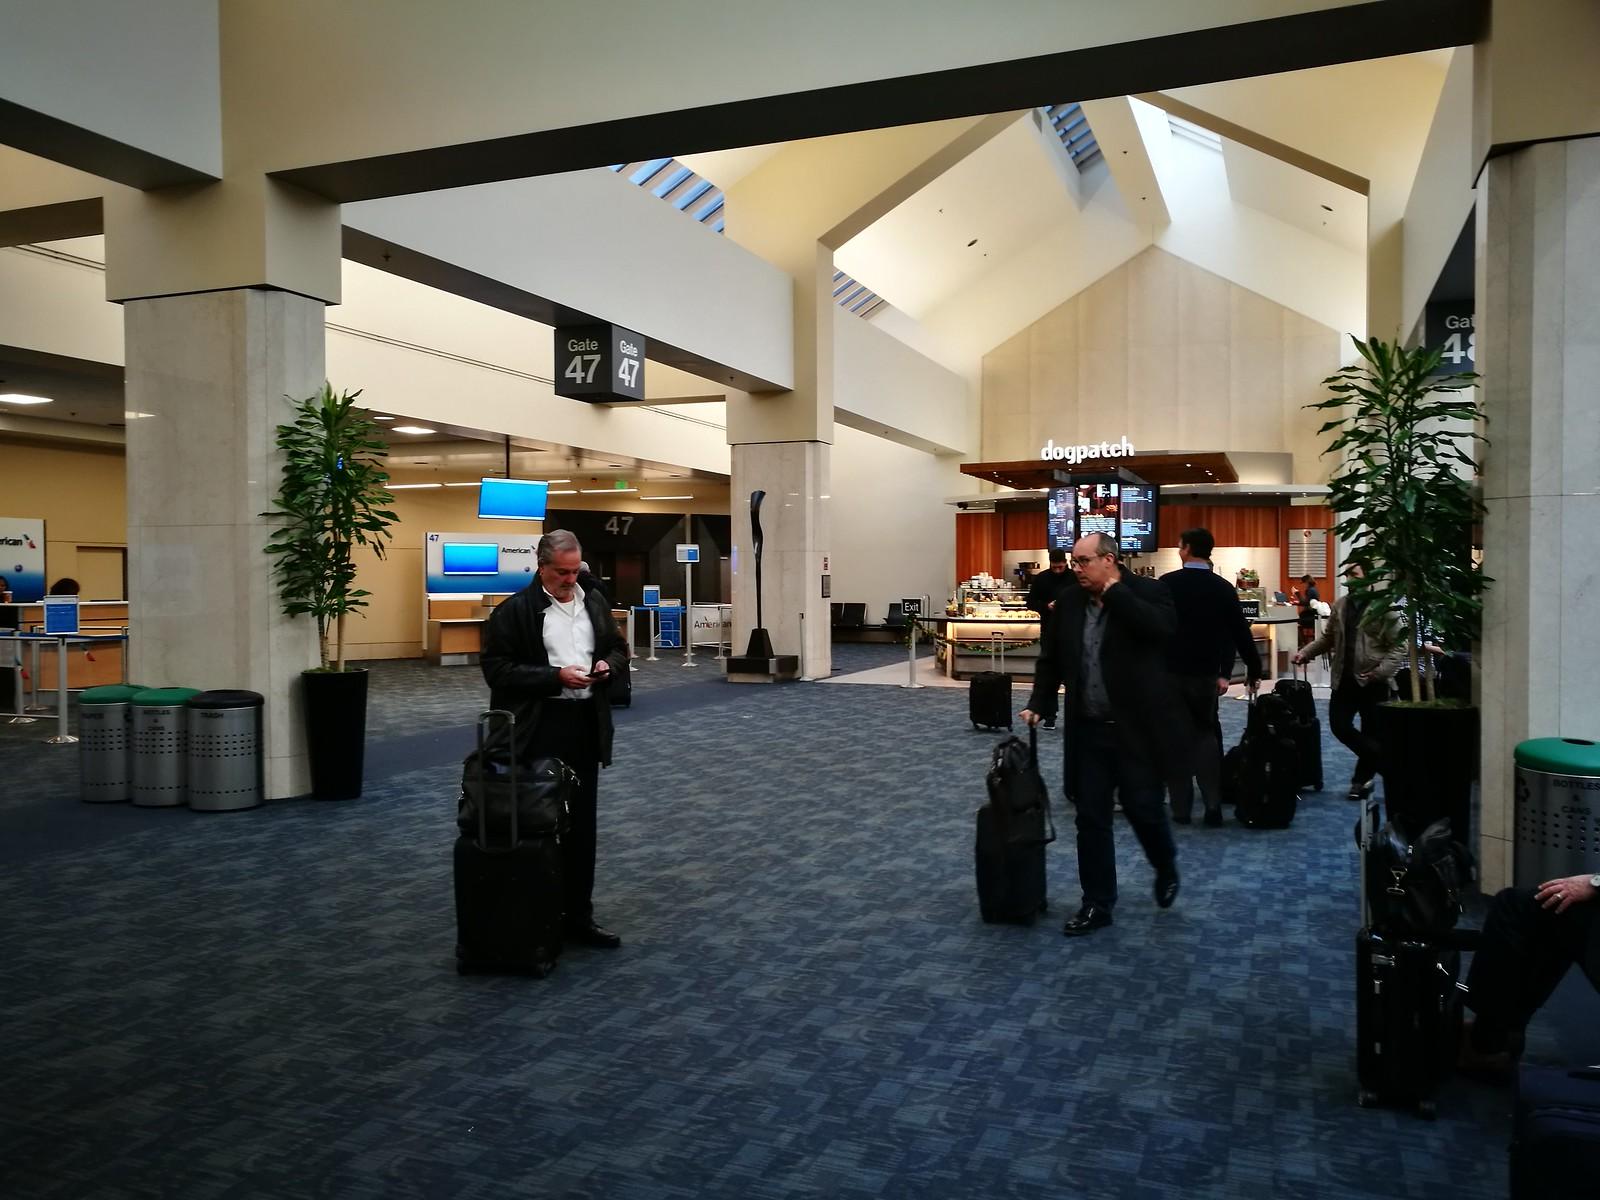 Delta's terminal